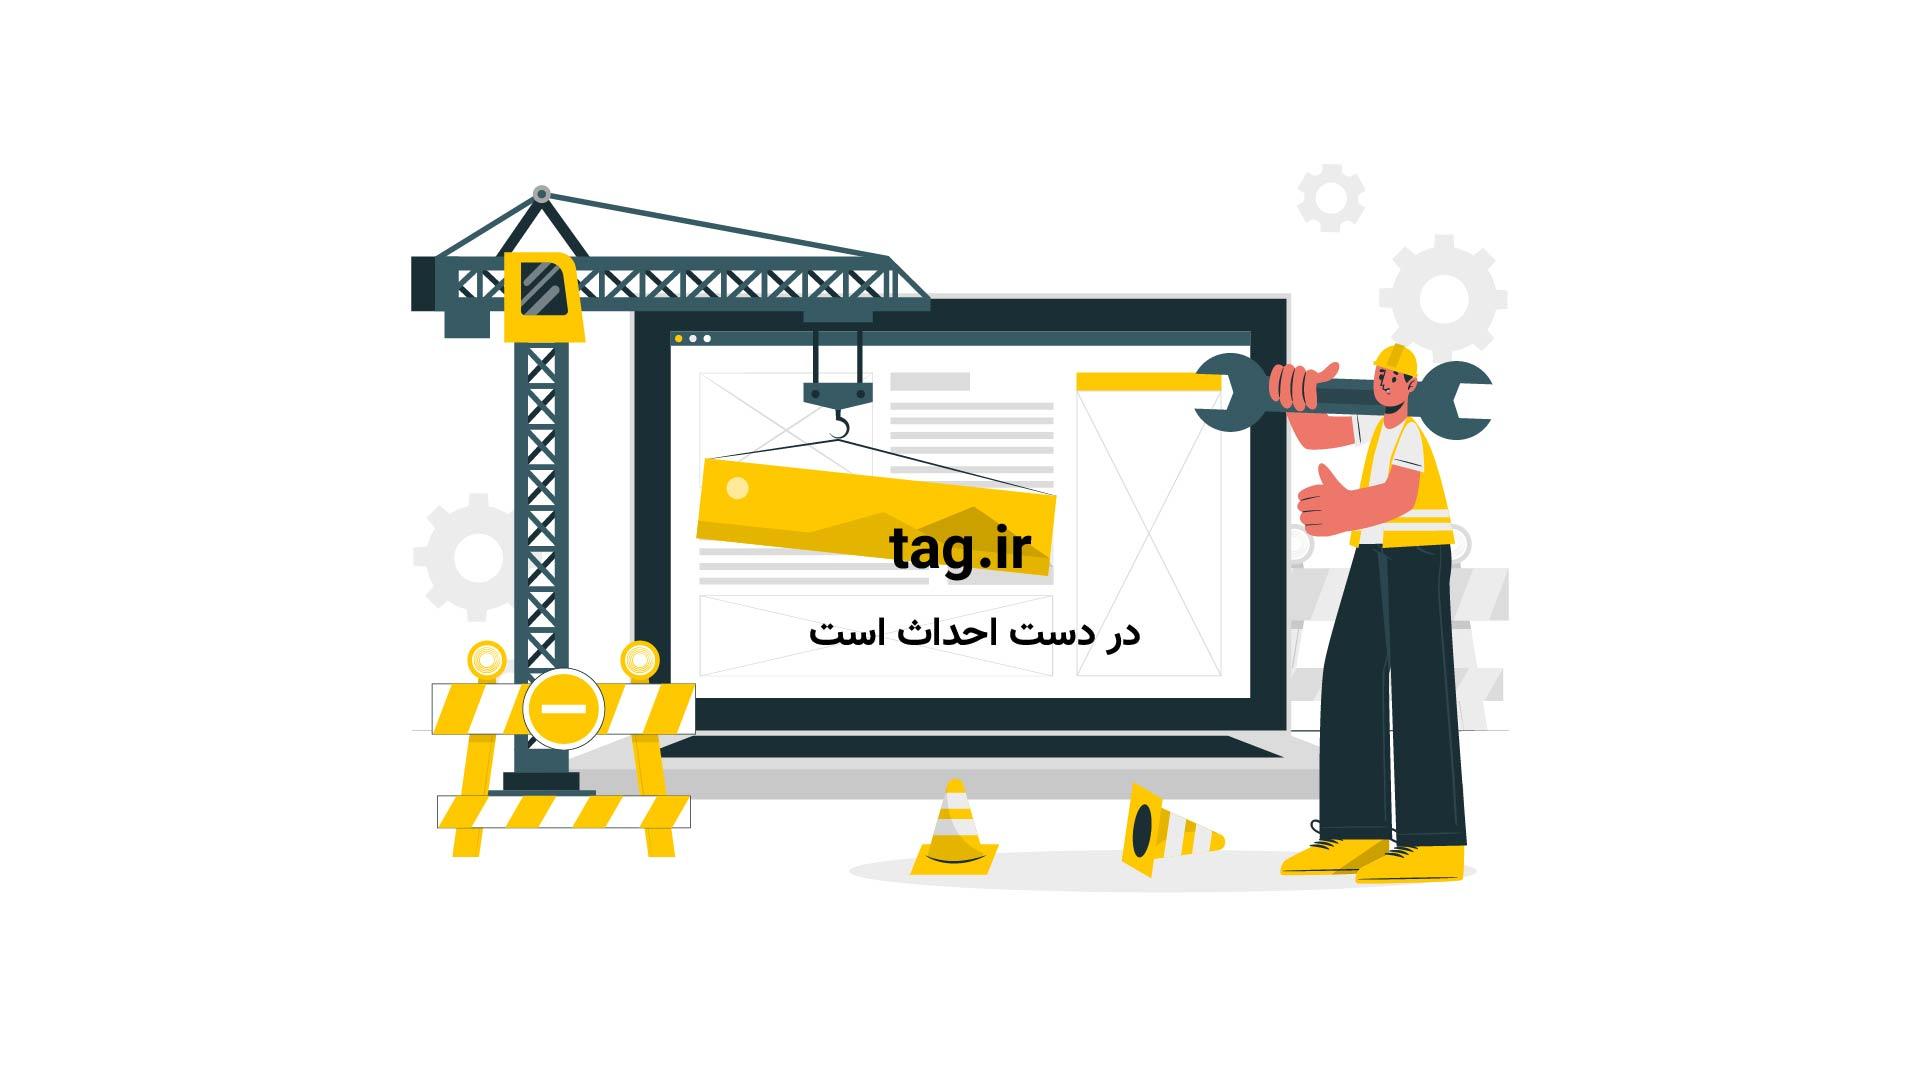 حمله خطرناک سگ ها | فیلم